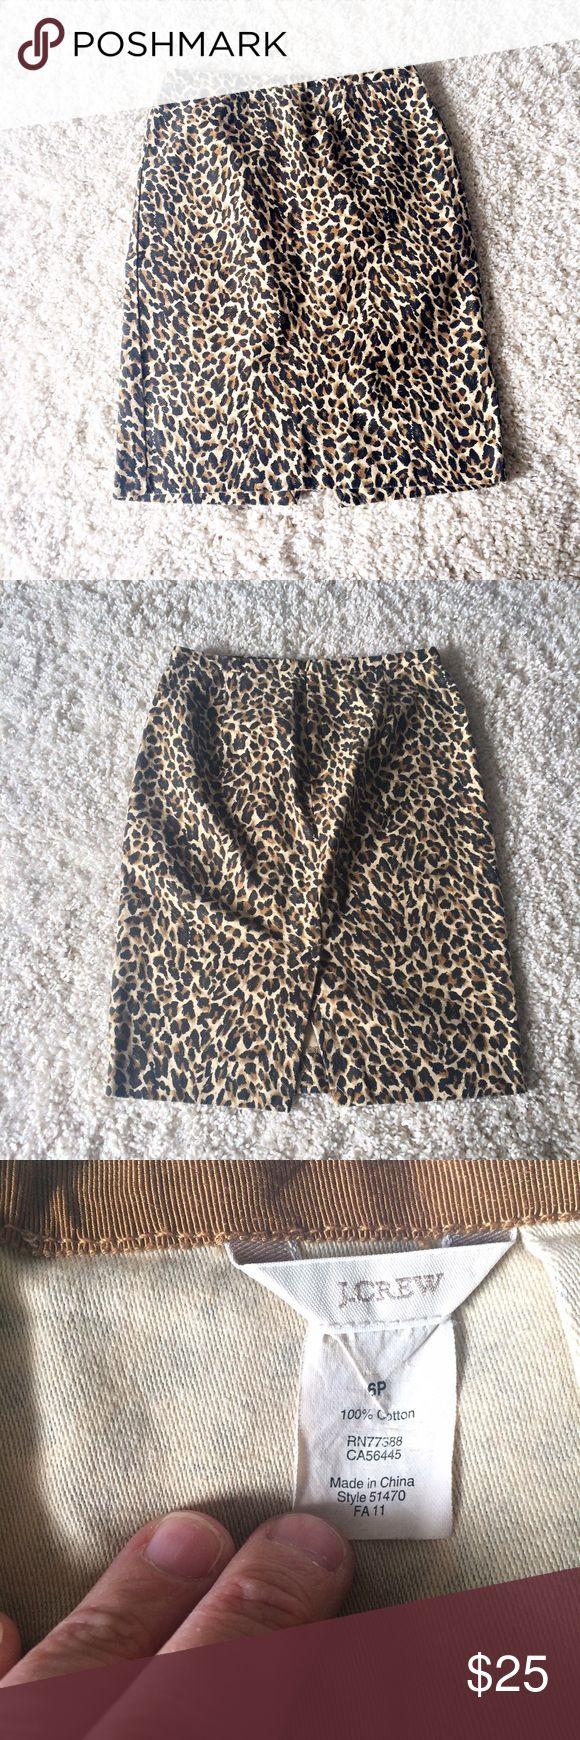 "J. CREW Leopard print Pencil Skirt petite Adorable pencil skirt in size 6 Petite. 100% cotton. Back zipper. Length 22.5"". Waist 14.5"". Leopard print. No damage, normal wash wear. J. Crew Skirts Pencil"